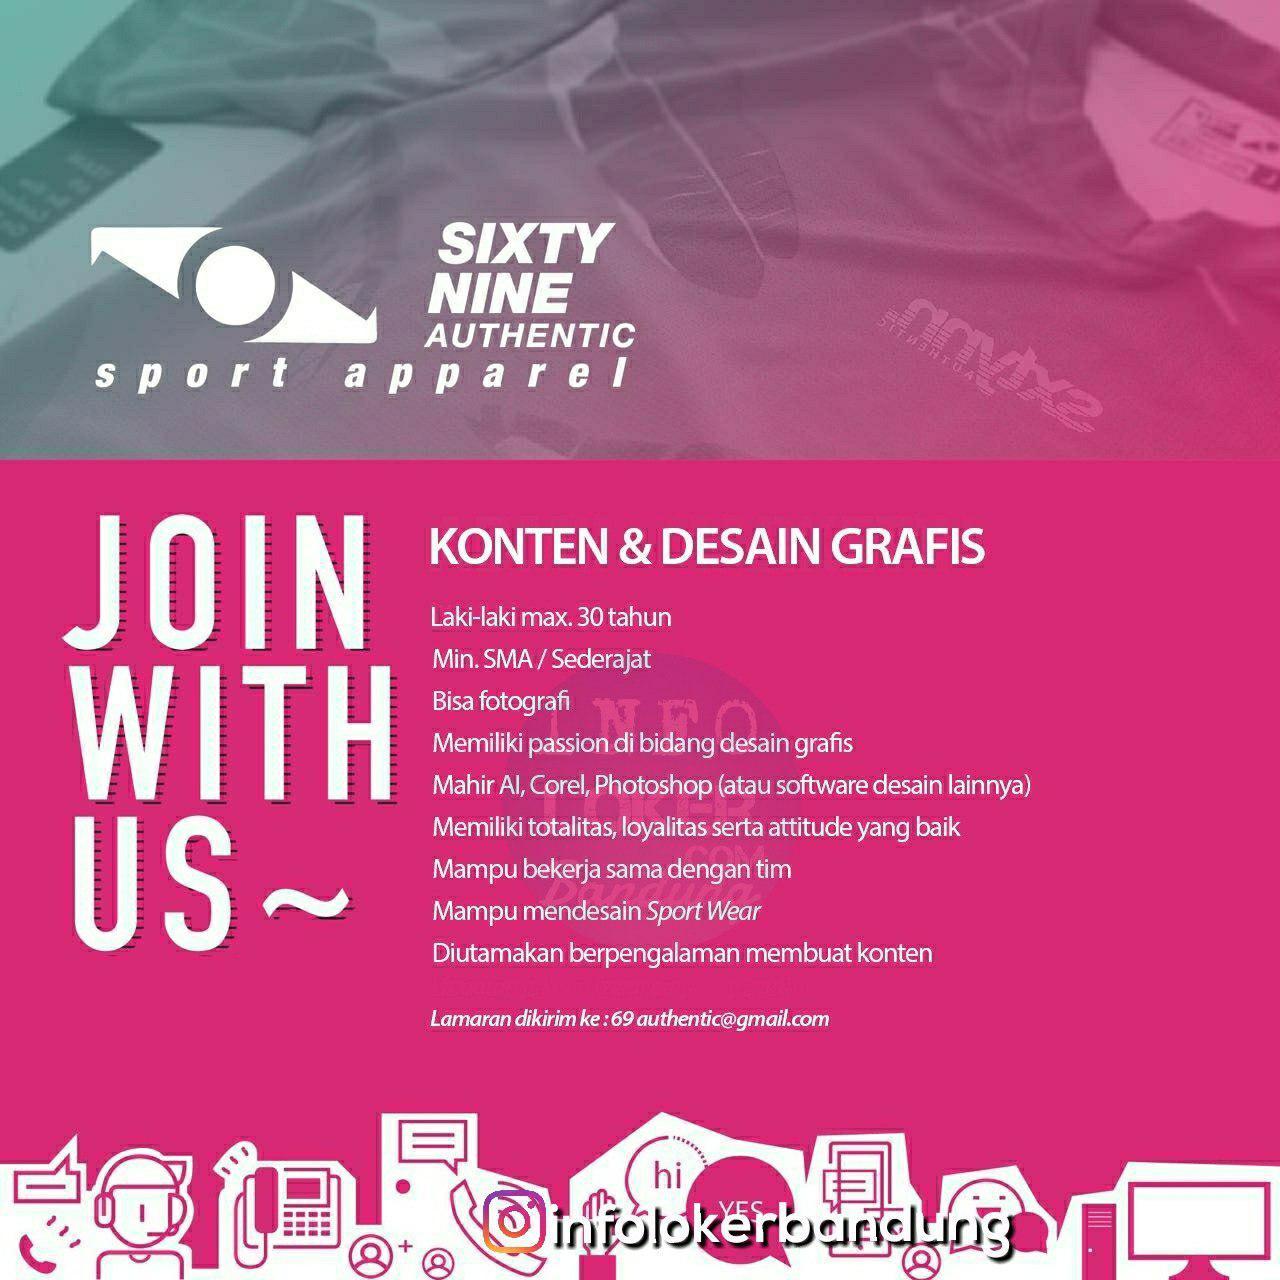 Lowongan Kerja Sixty Nine Authentic Sport Apparel Bandung Juli 2018